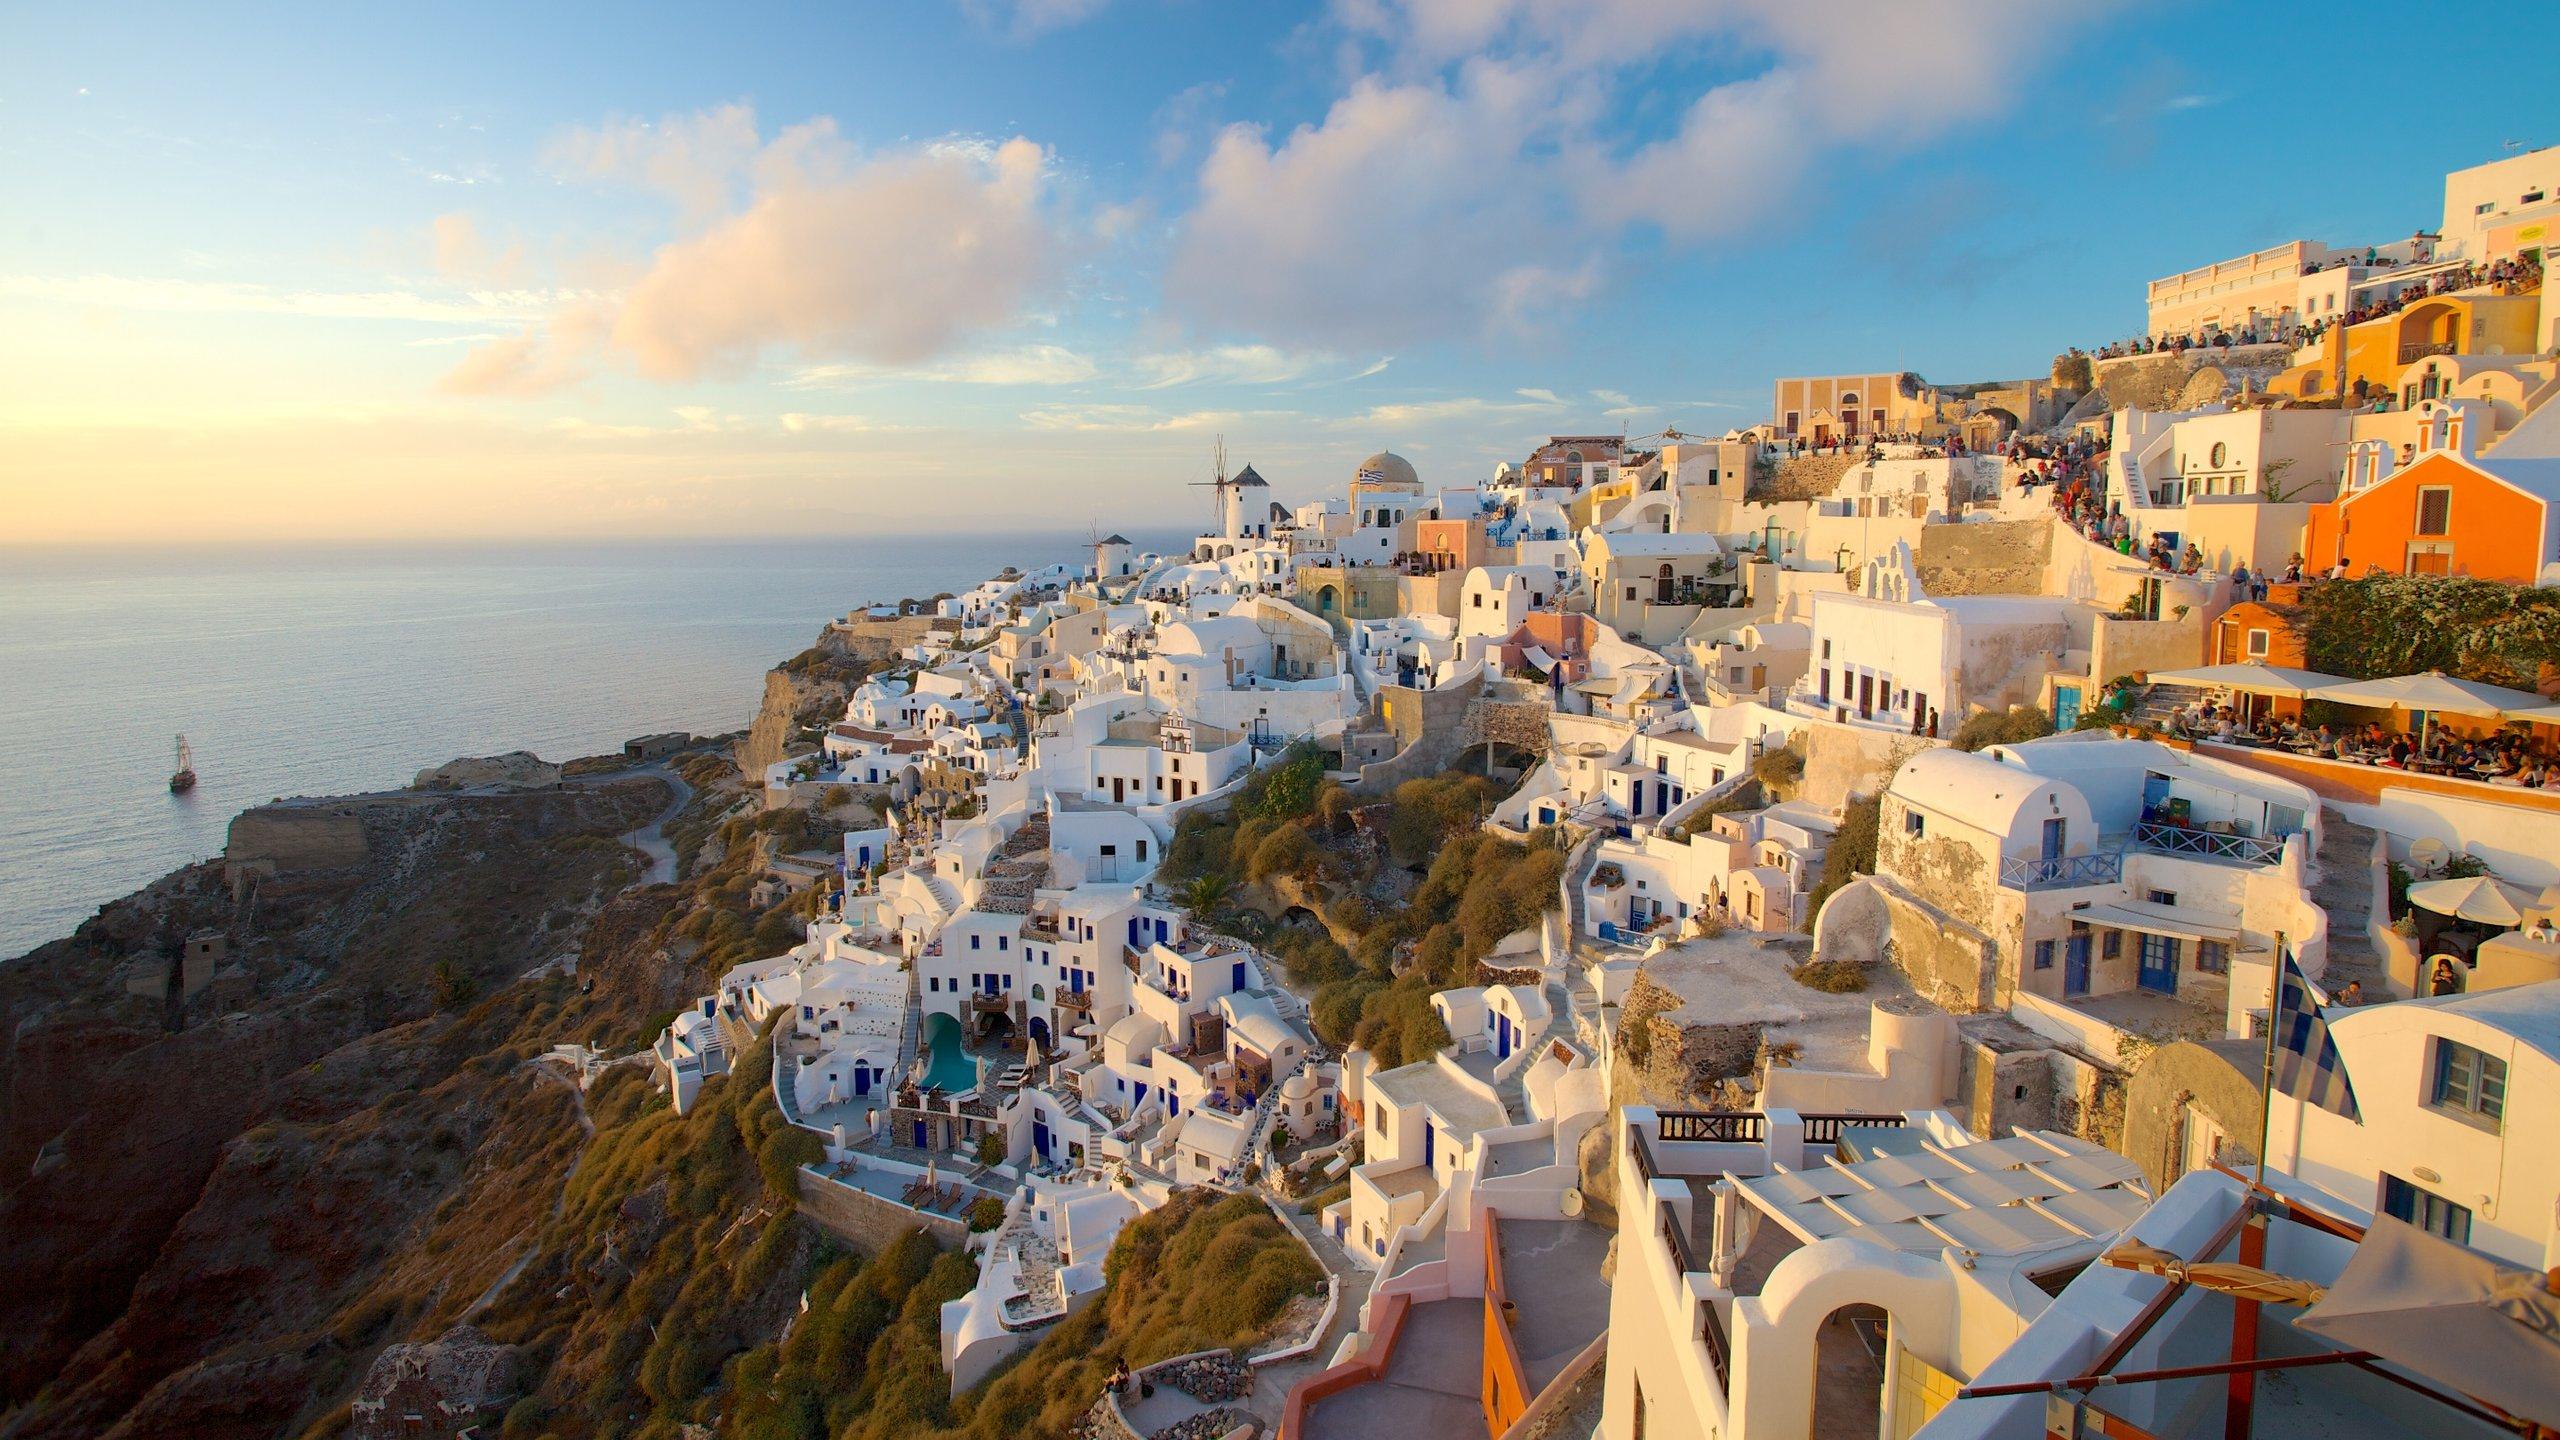 Oia, Santorini, South Aegean, Greece